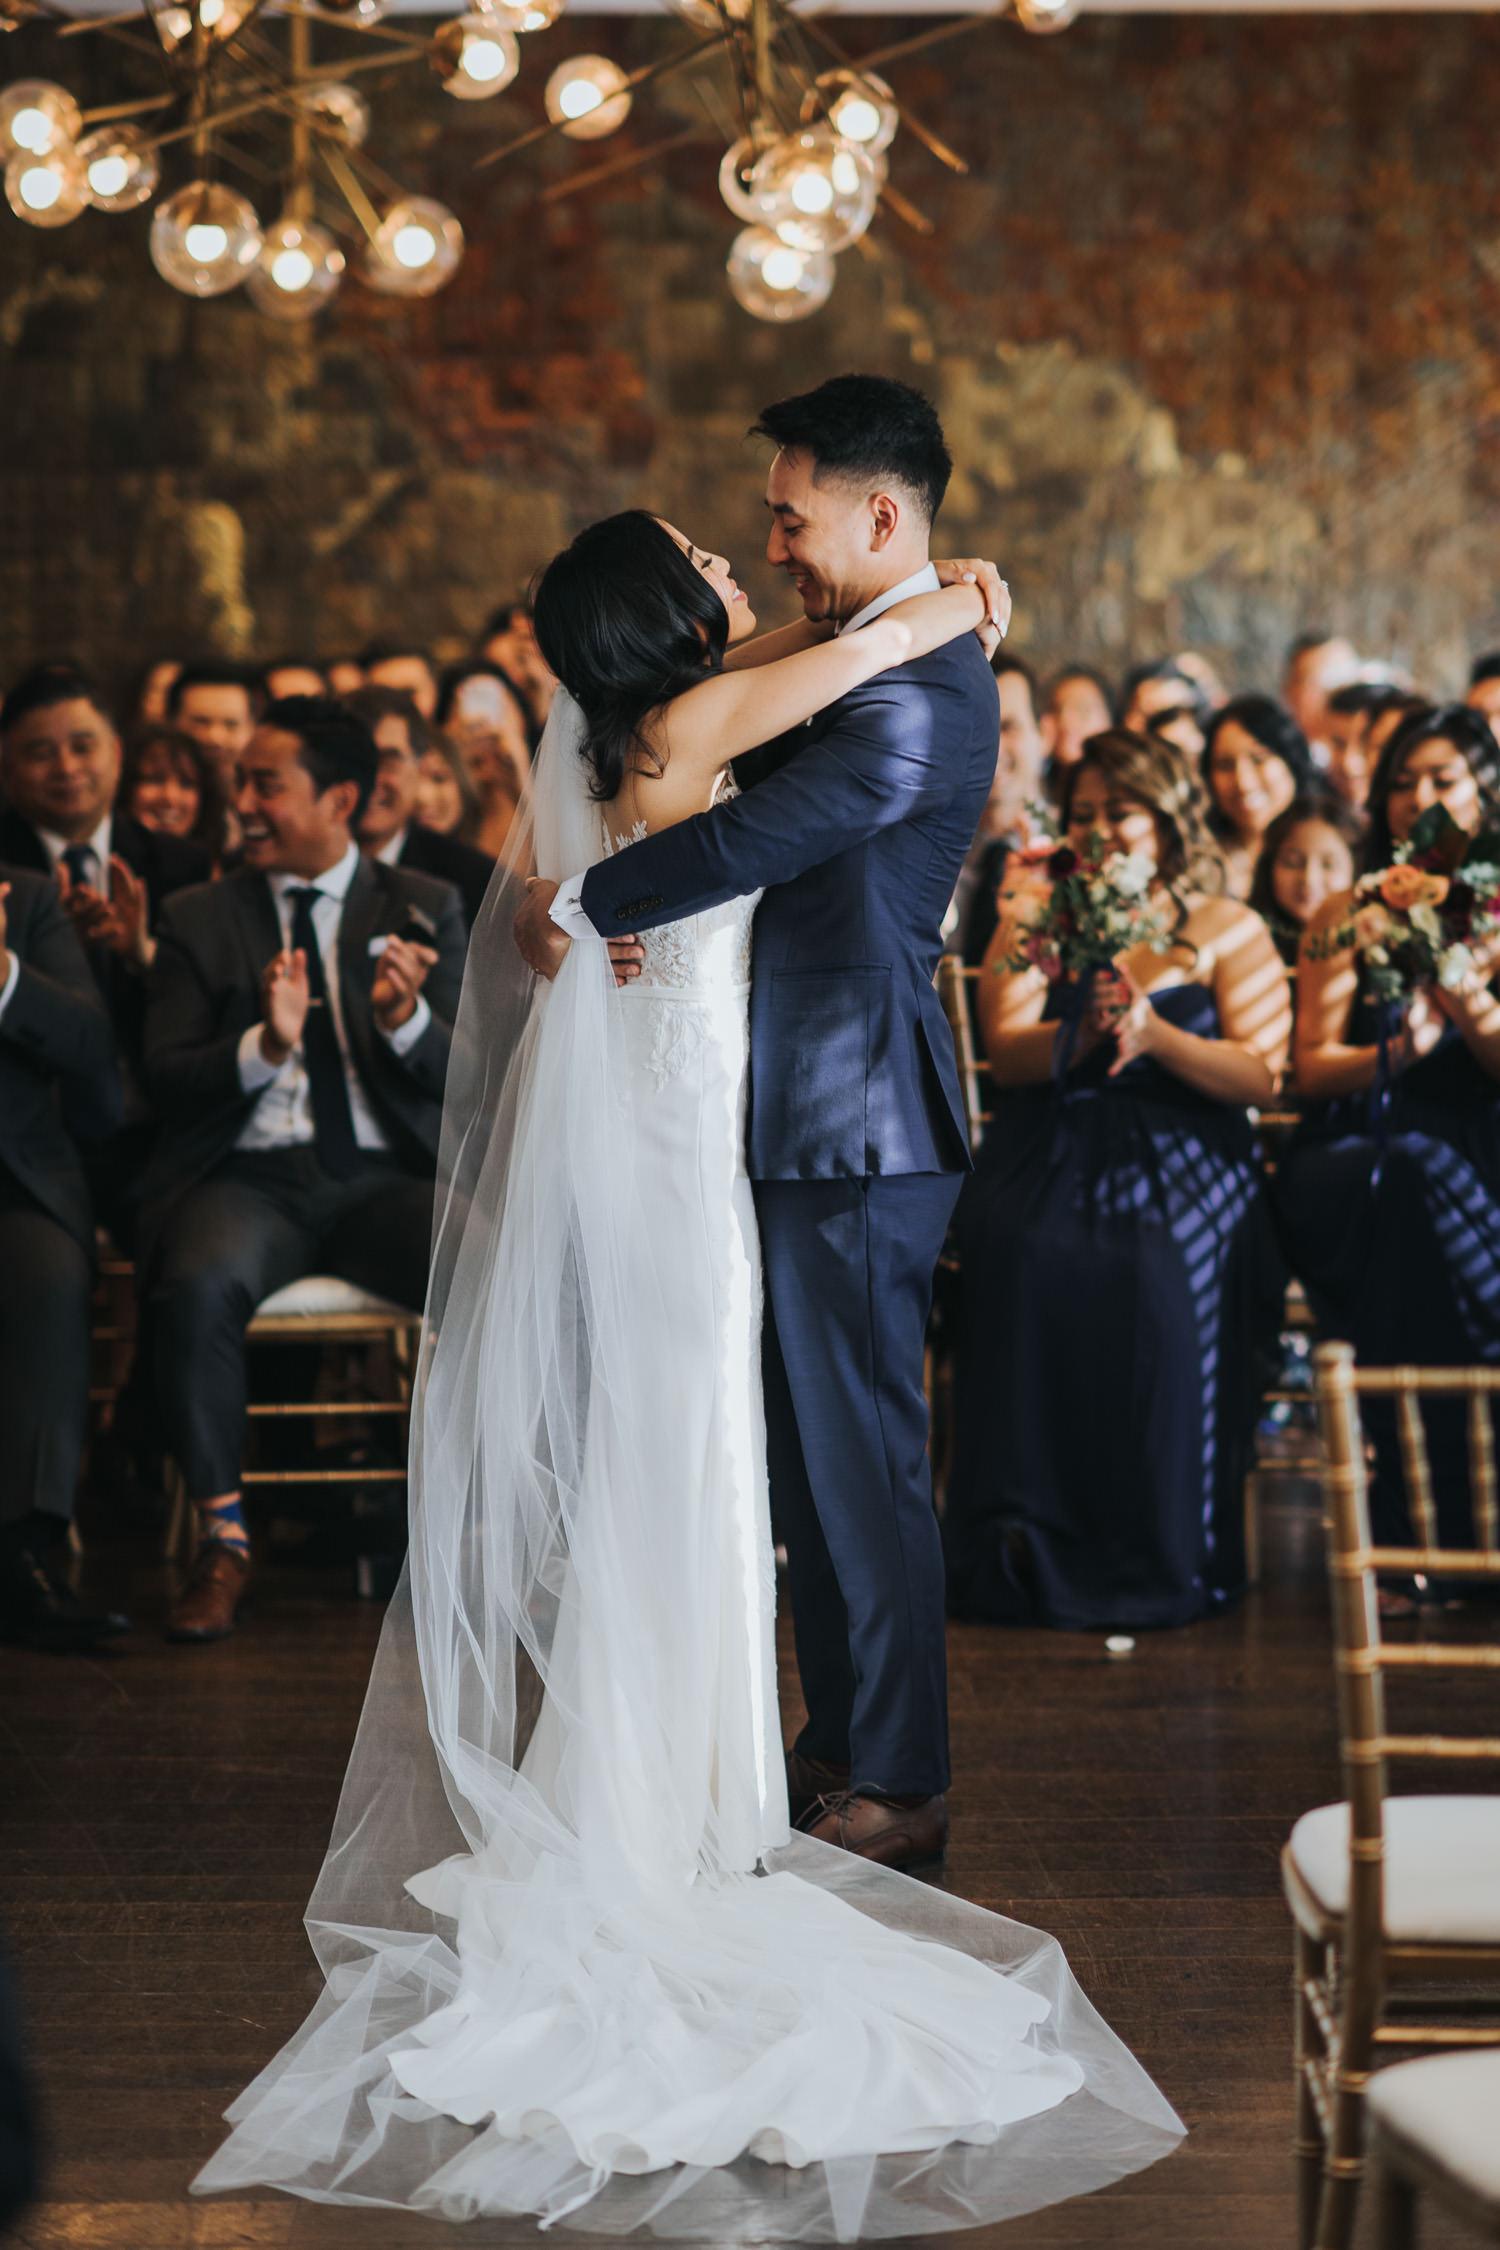 Toronto Canoe Wedding Ceremony First Kiss